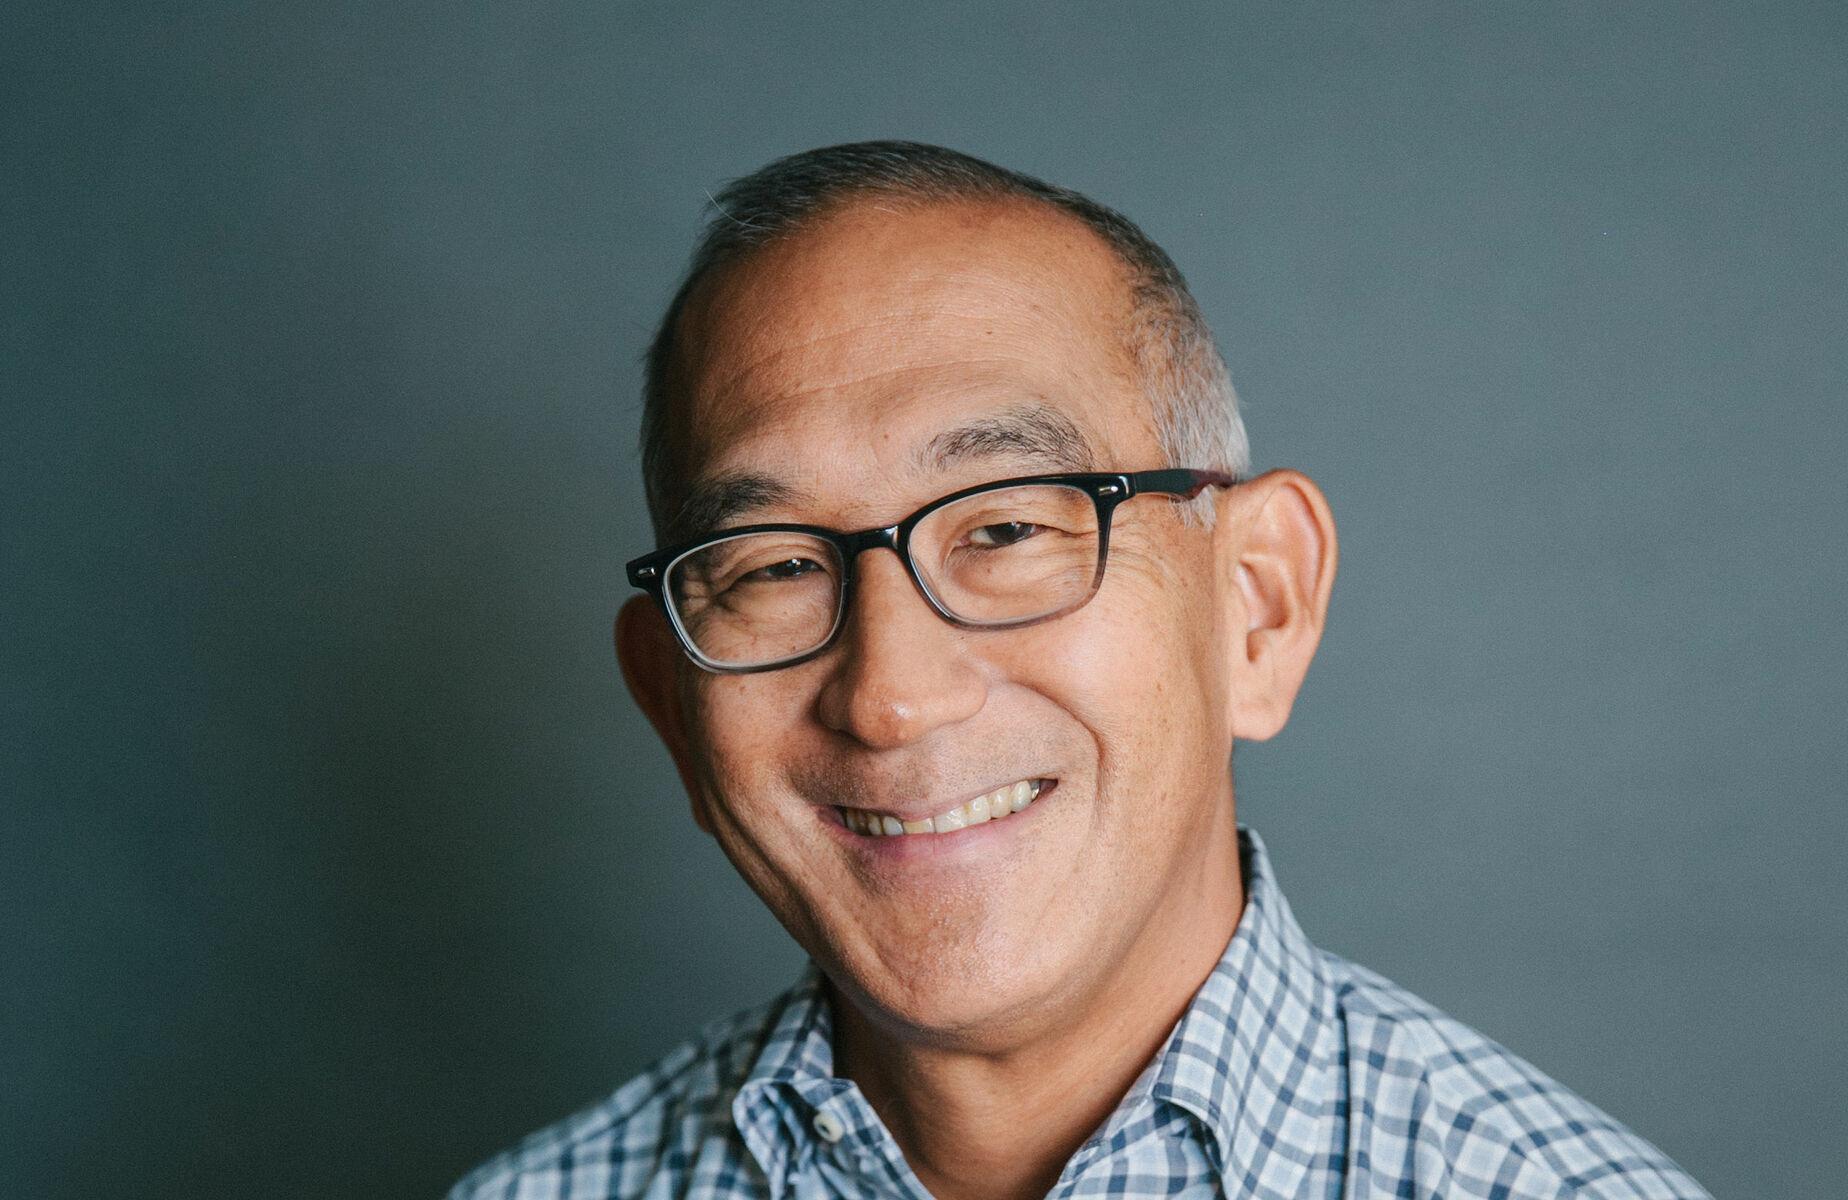 CMO Profile: Carl Tsukahara, CMO of Optimizely